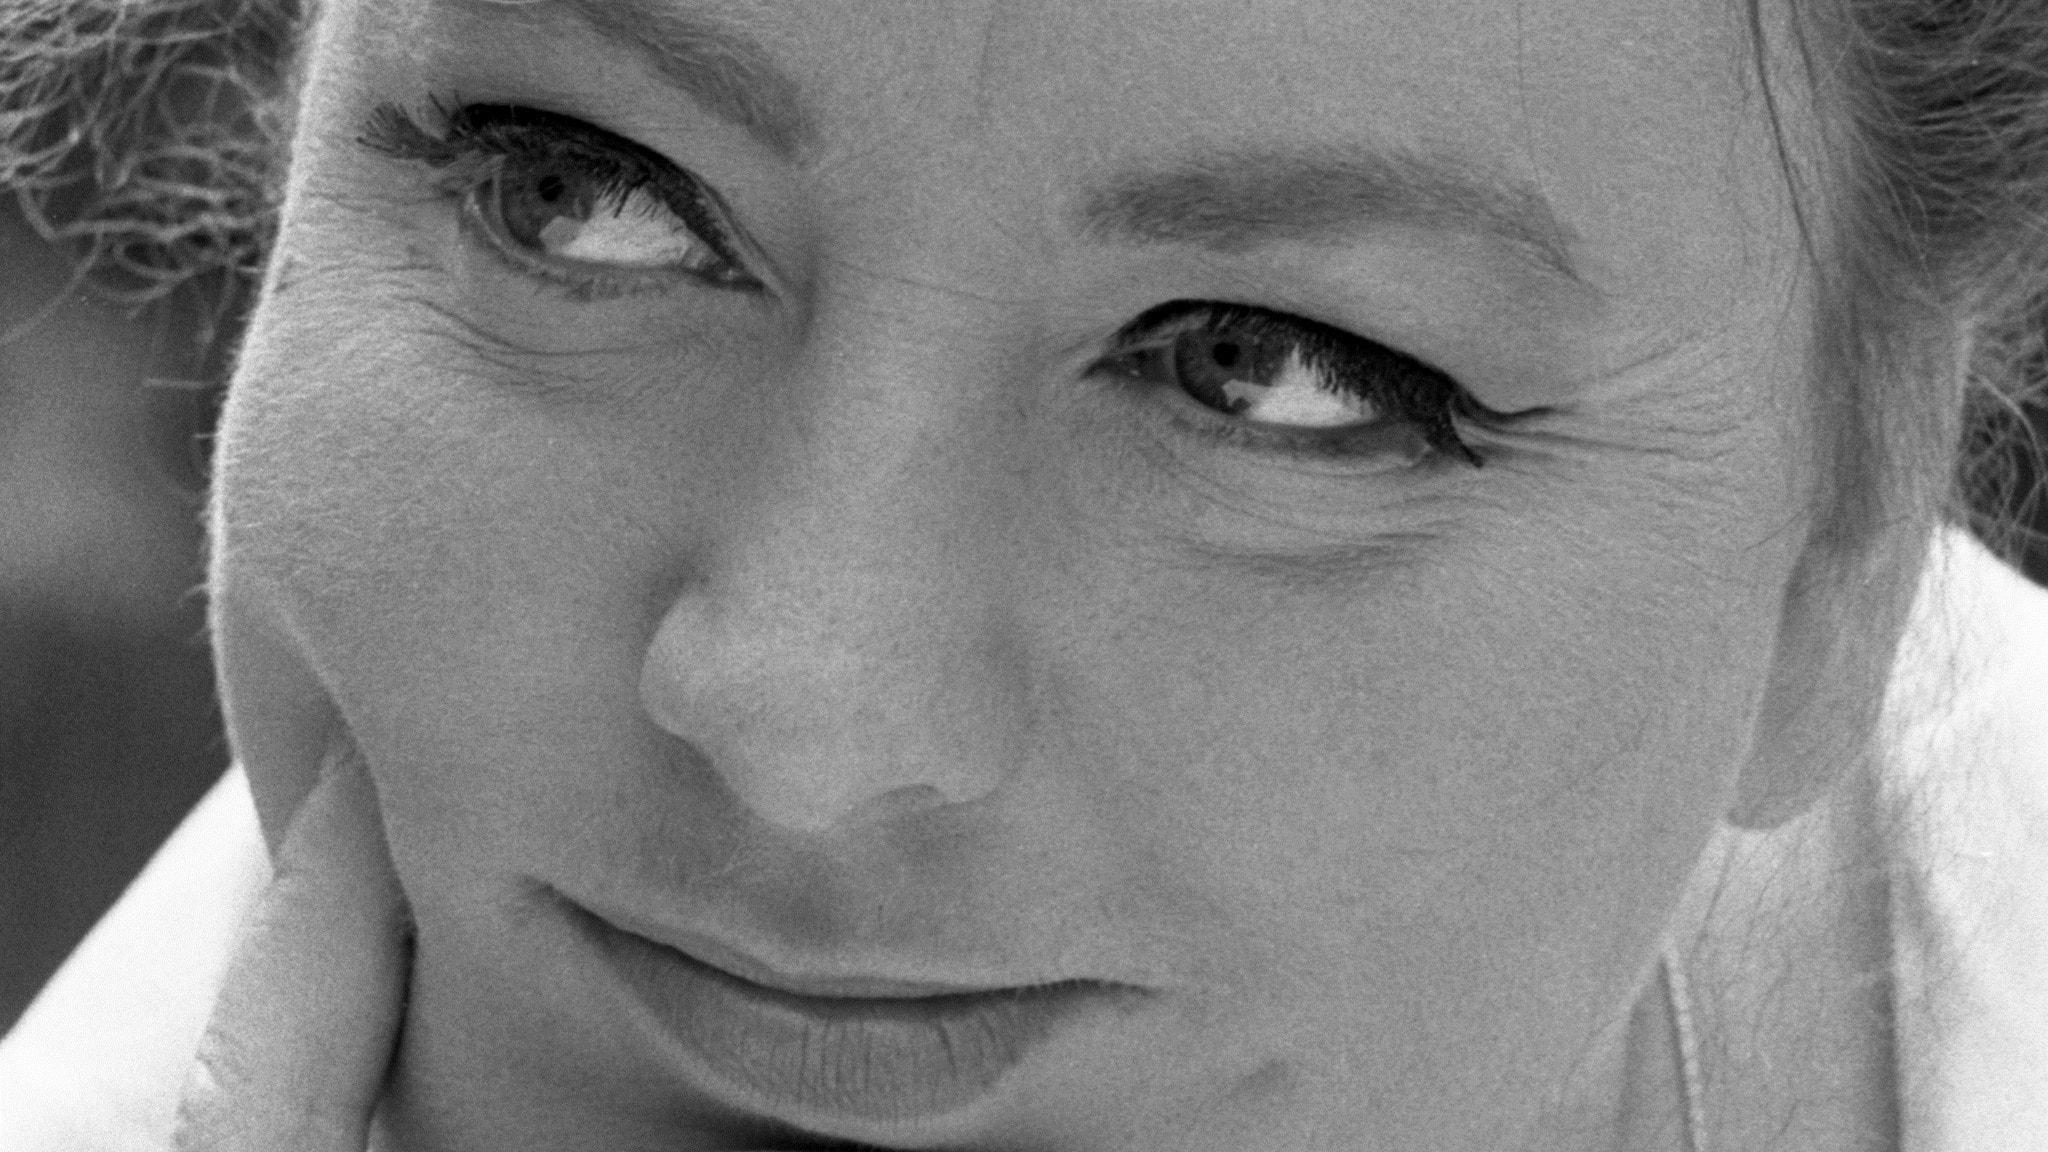 Sonya Hedenbratt, synonym med staden Göteborg